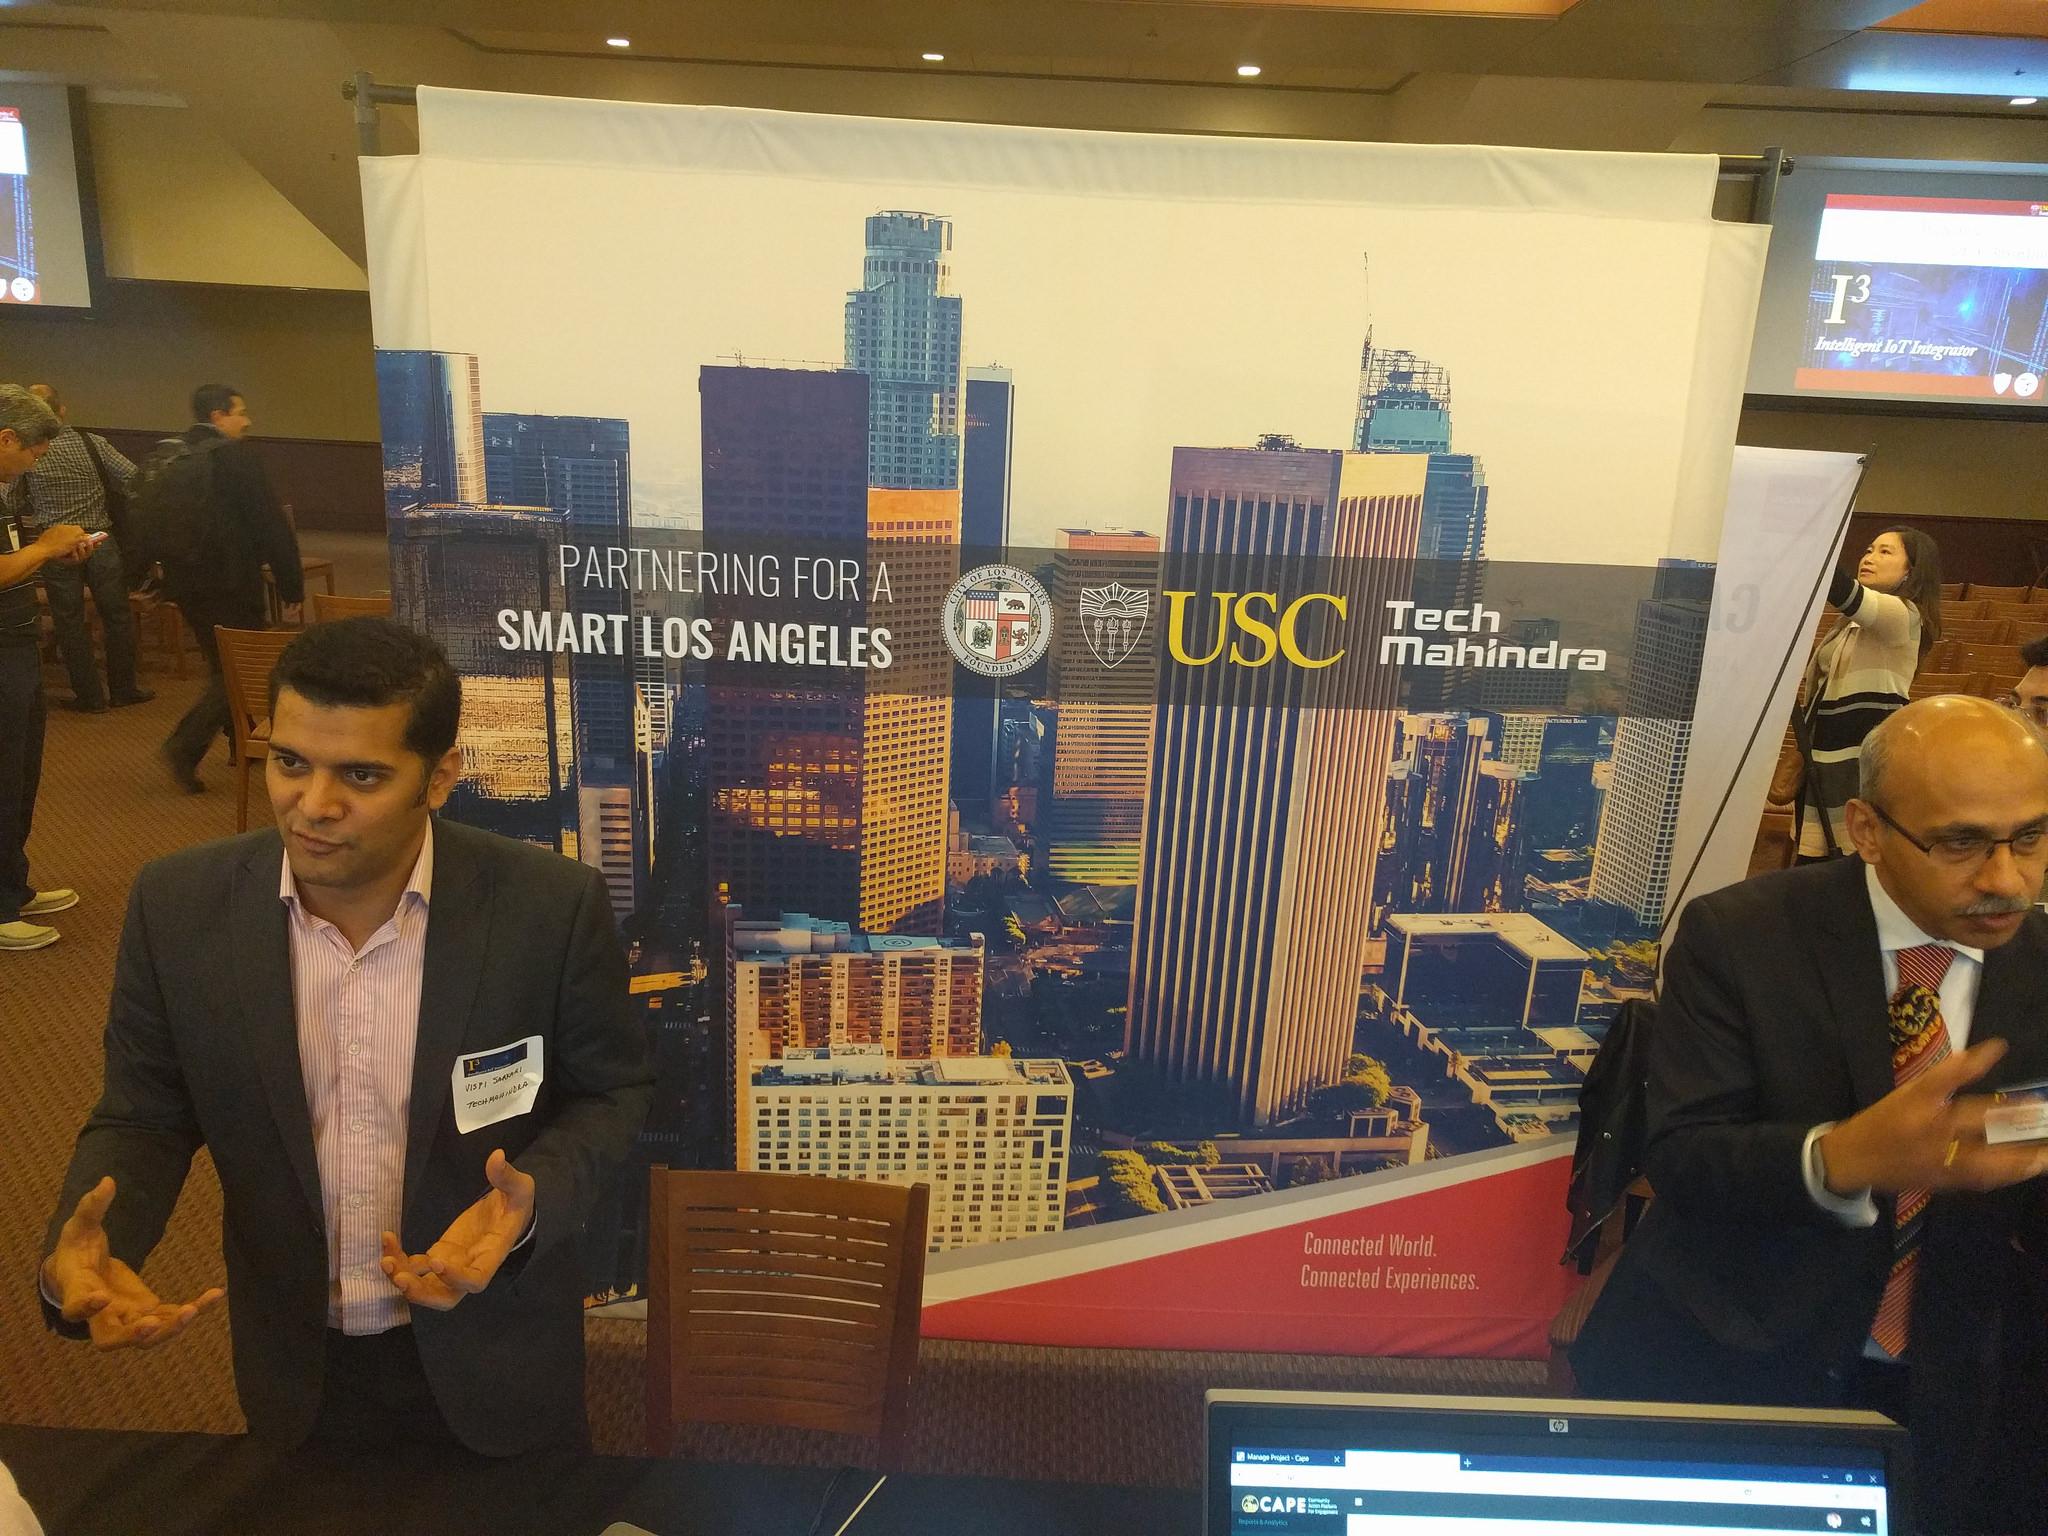 Cci Helps Launch Iot Consortium Cci